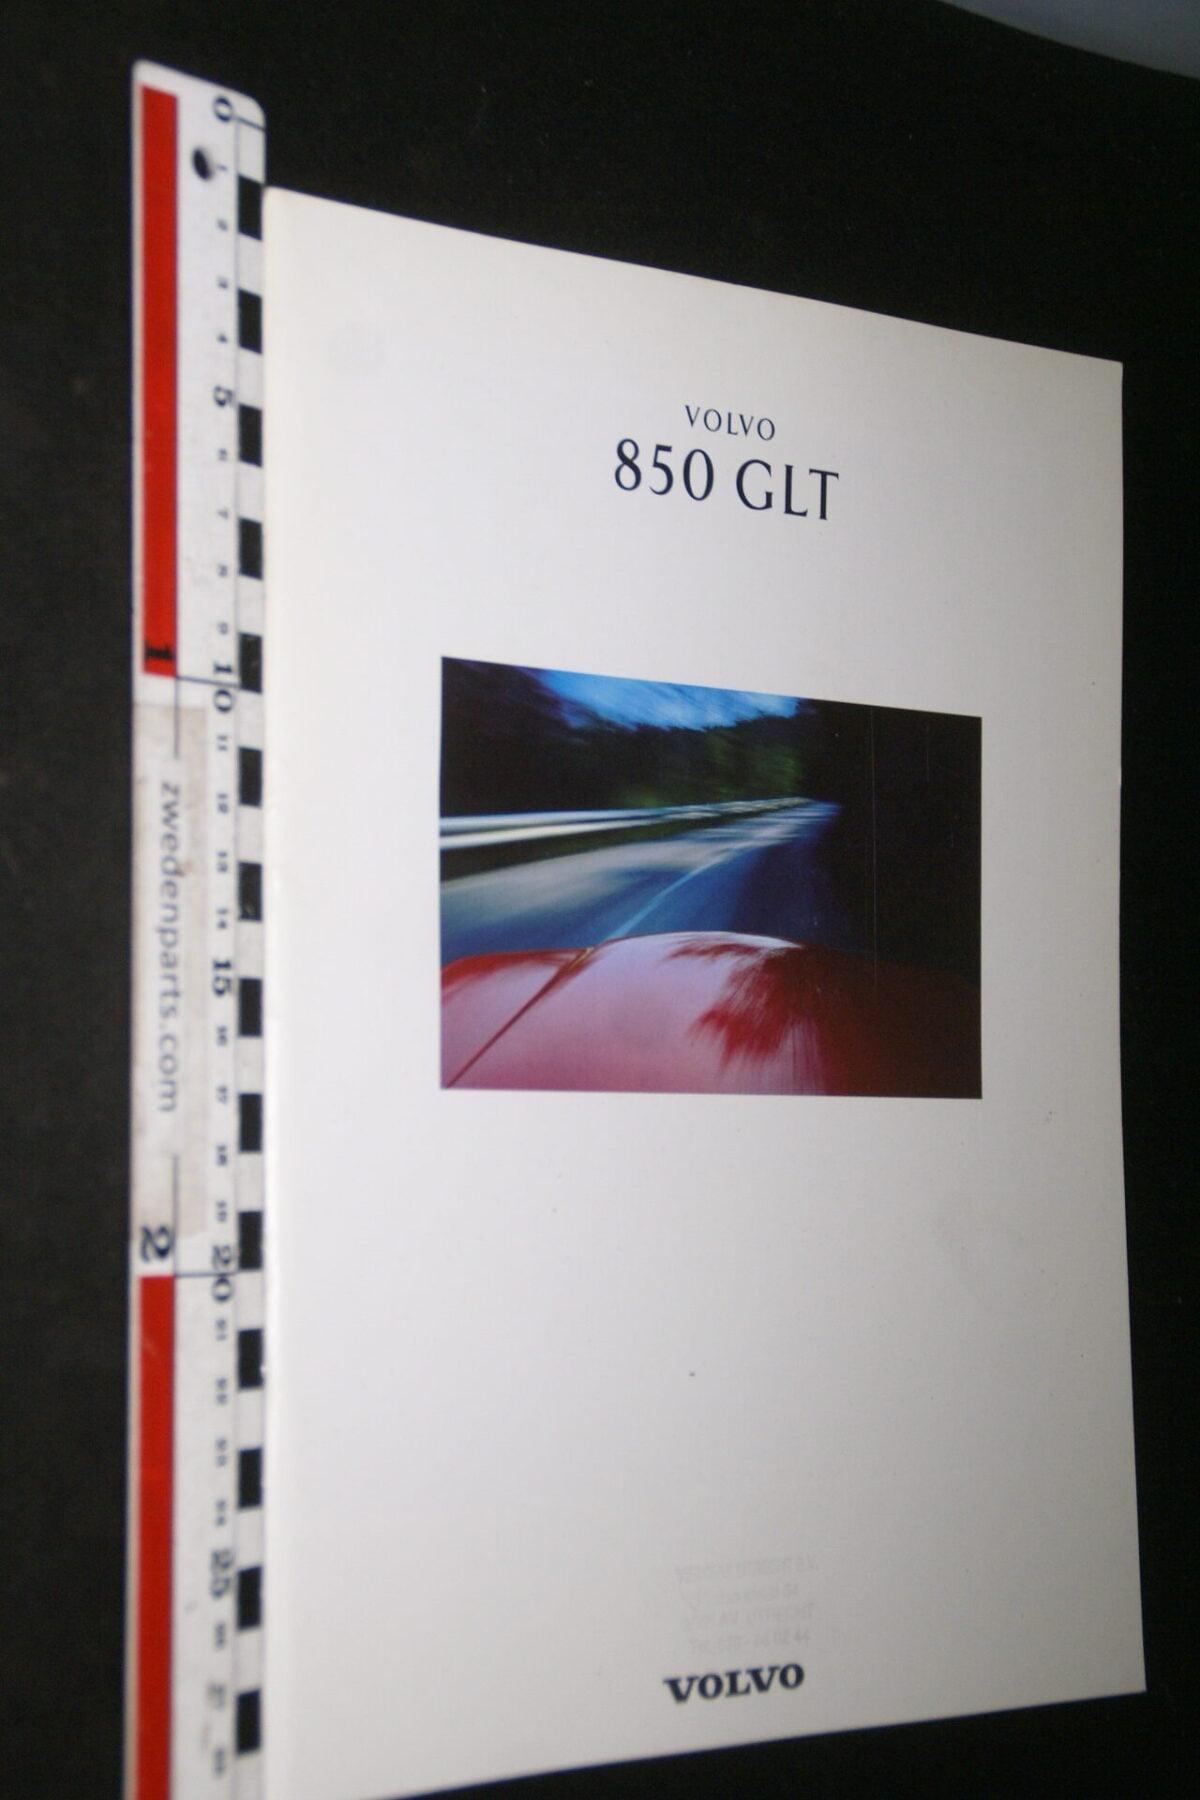 DSC05288 1992 originele brochure Volvo 850GLT nr MSPV 4775-31a9e9b9